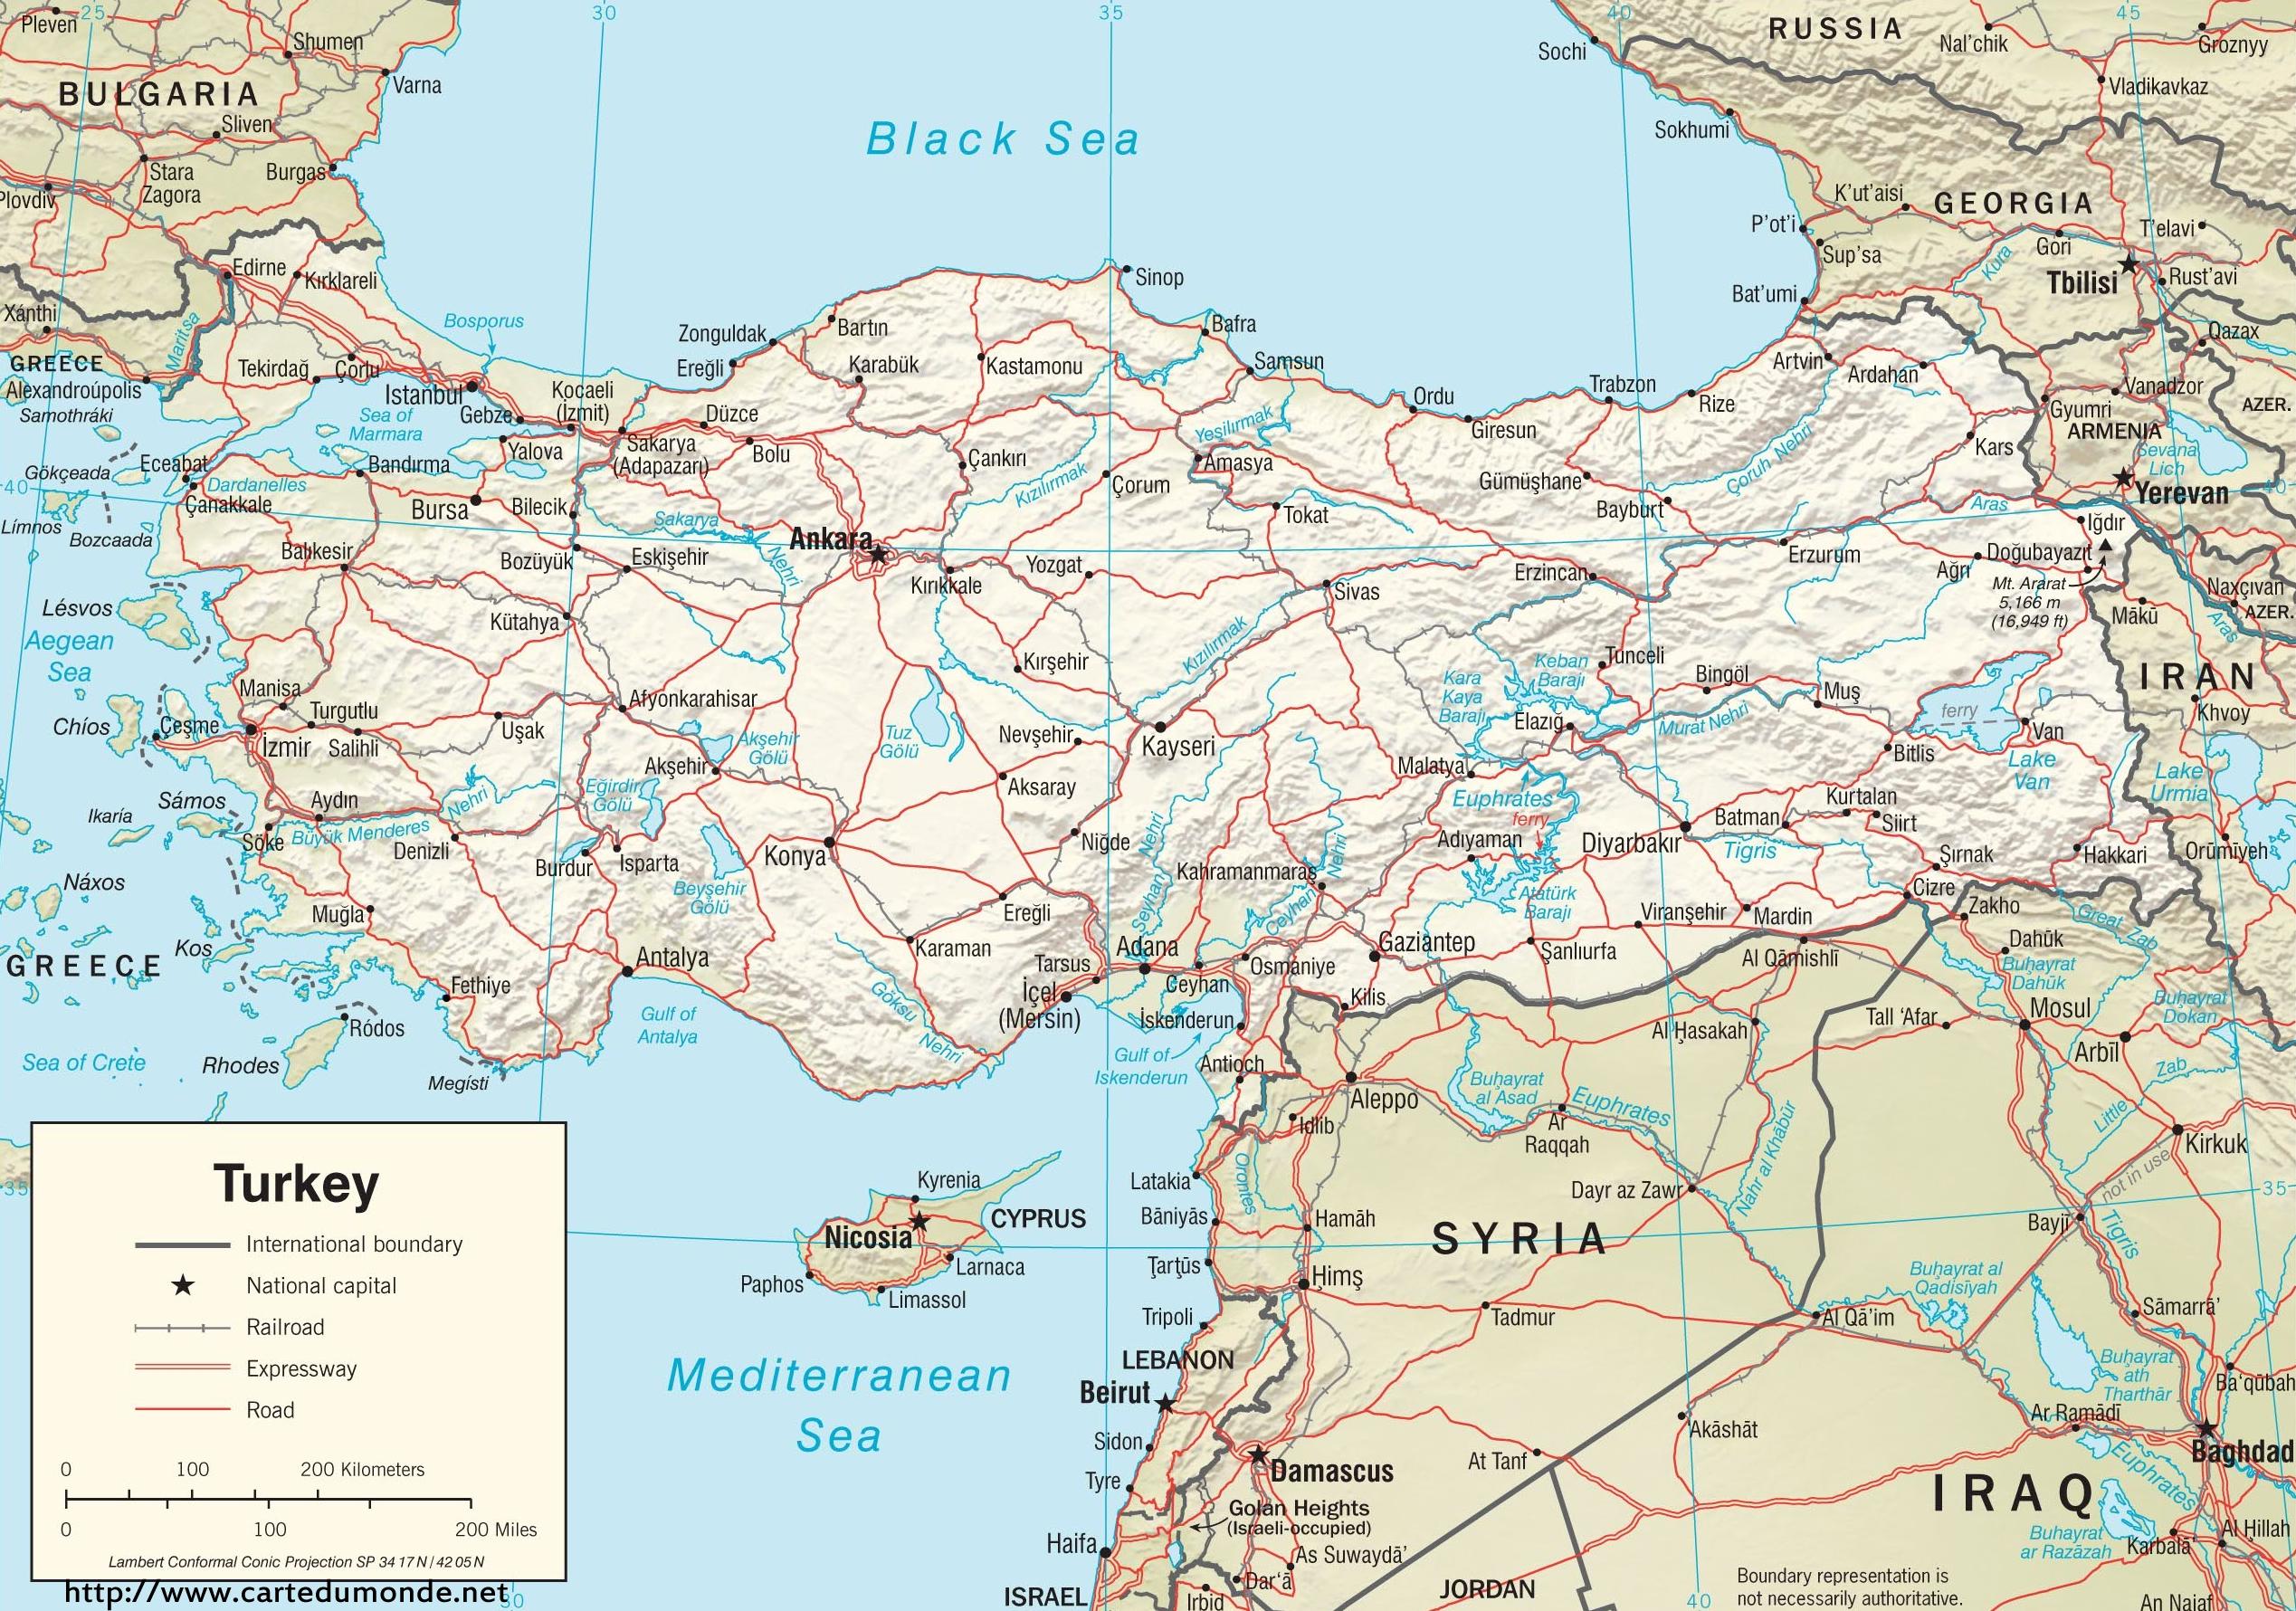 Karte Türkei.Karte Türkei Karte Auf Land Türkei